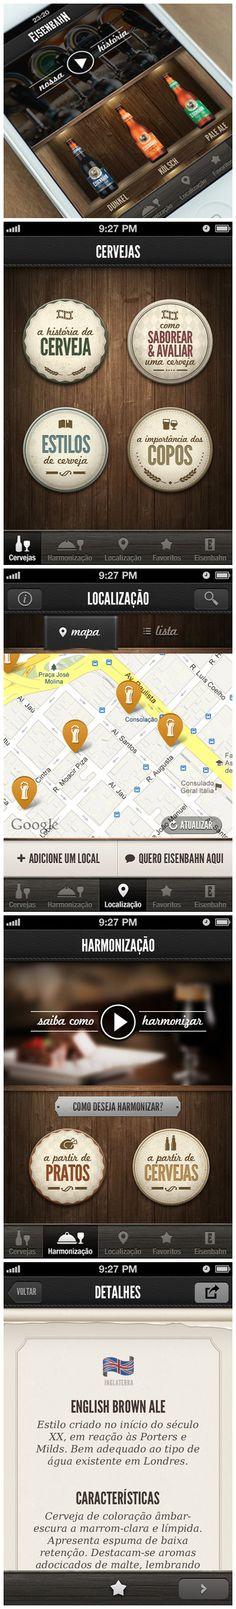 """Guia Eisenbahn"" iphone app #app #gui"